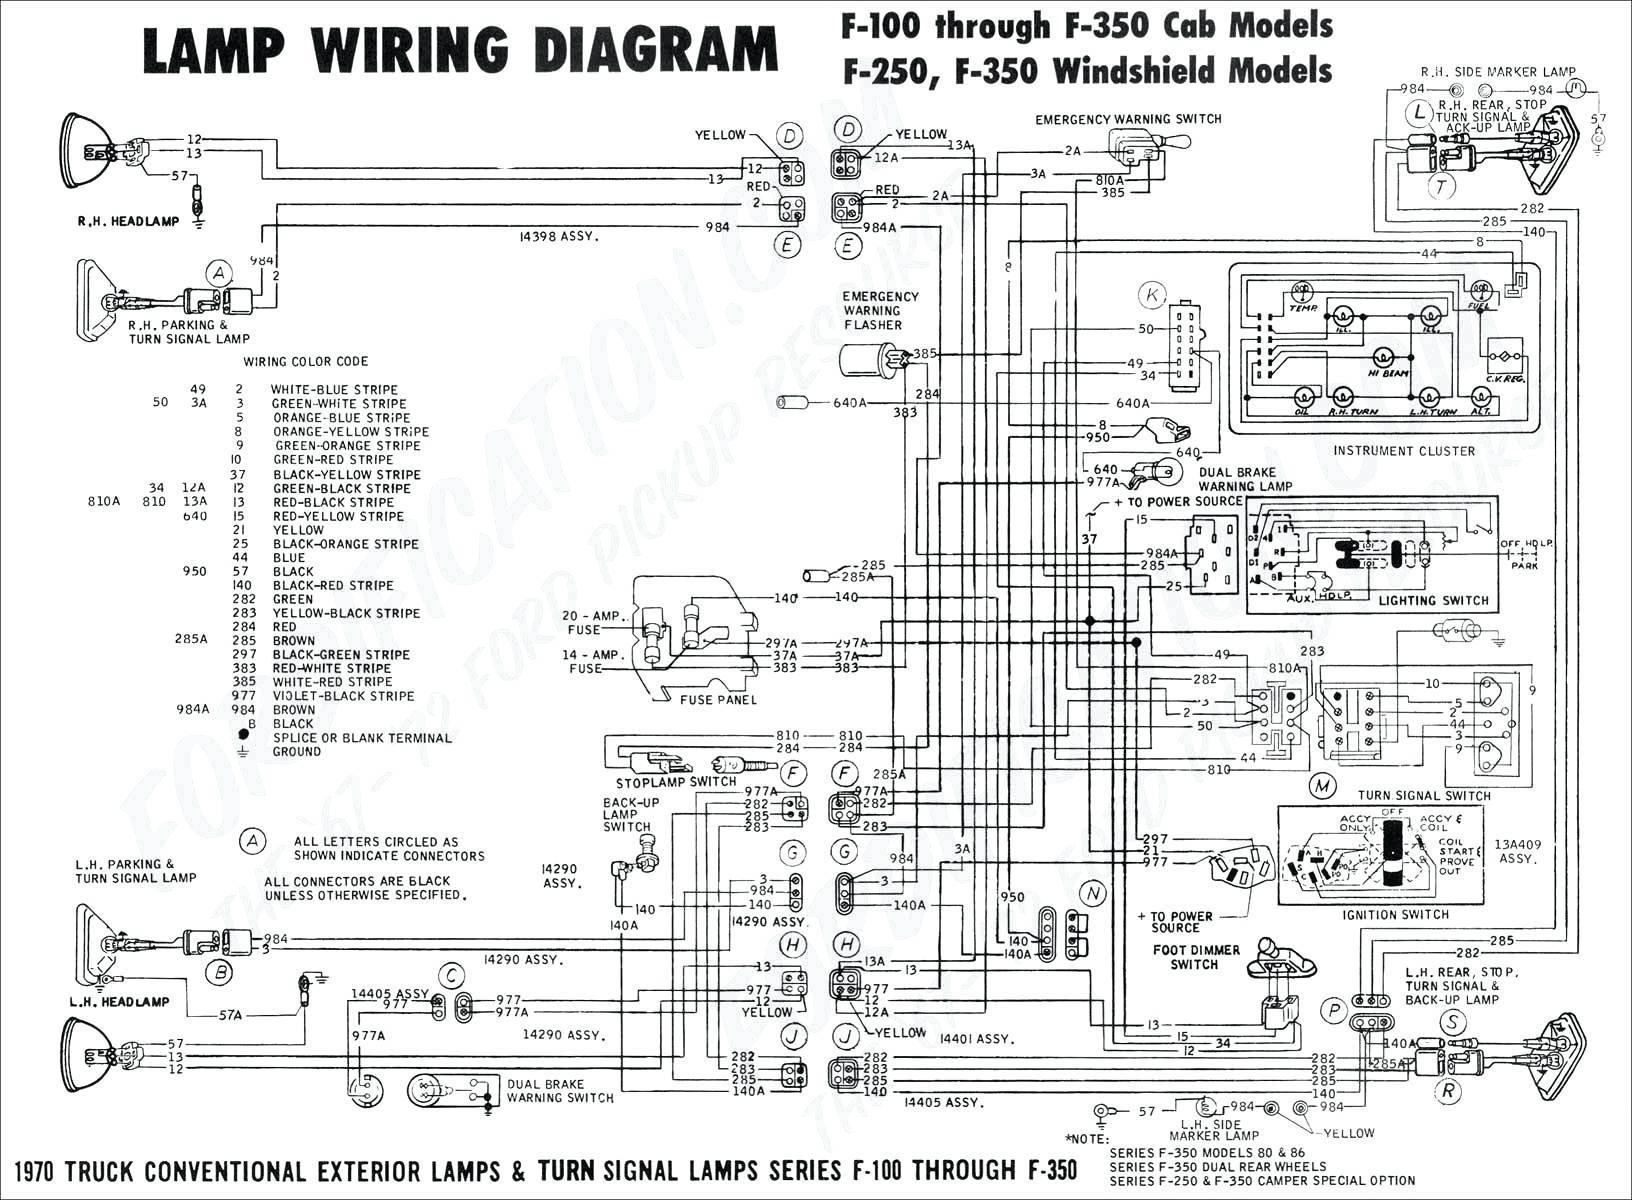 tata super ace wiring diagram pdf wiring diagramtata super ace wiring diagram pdf